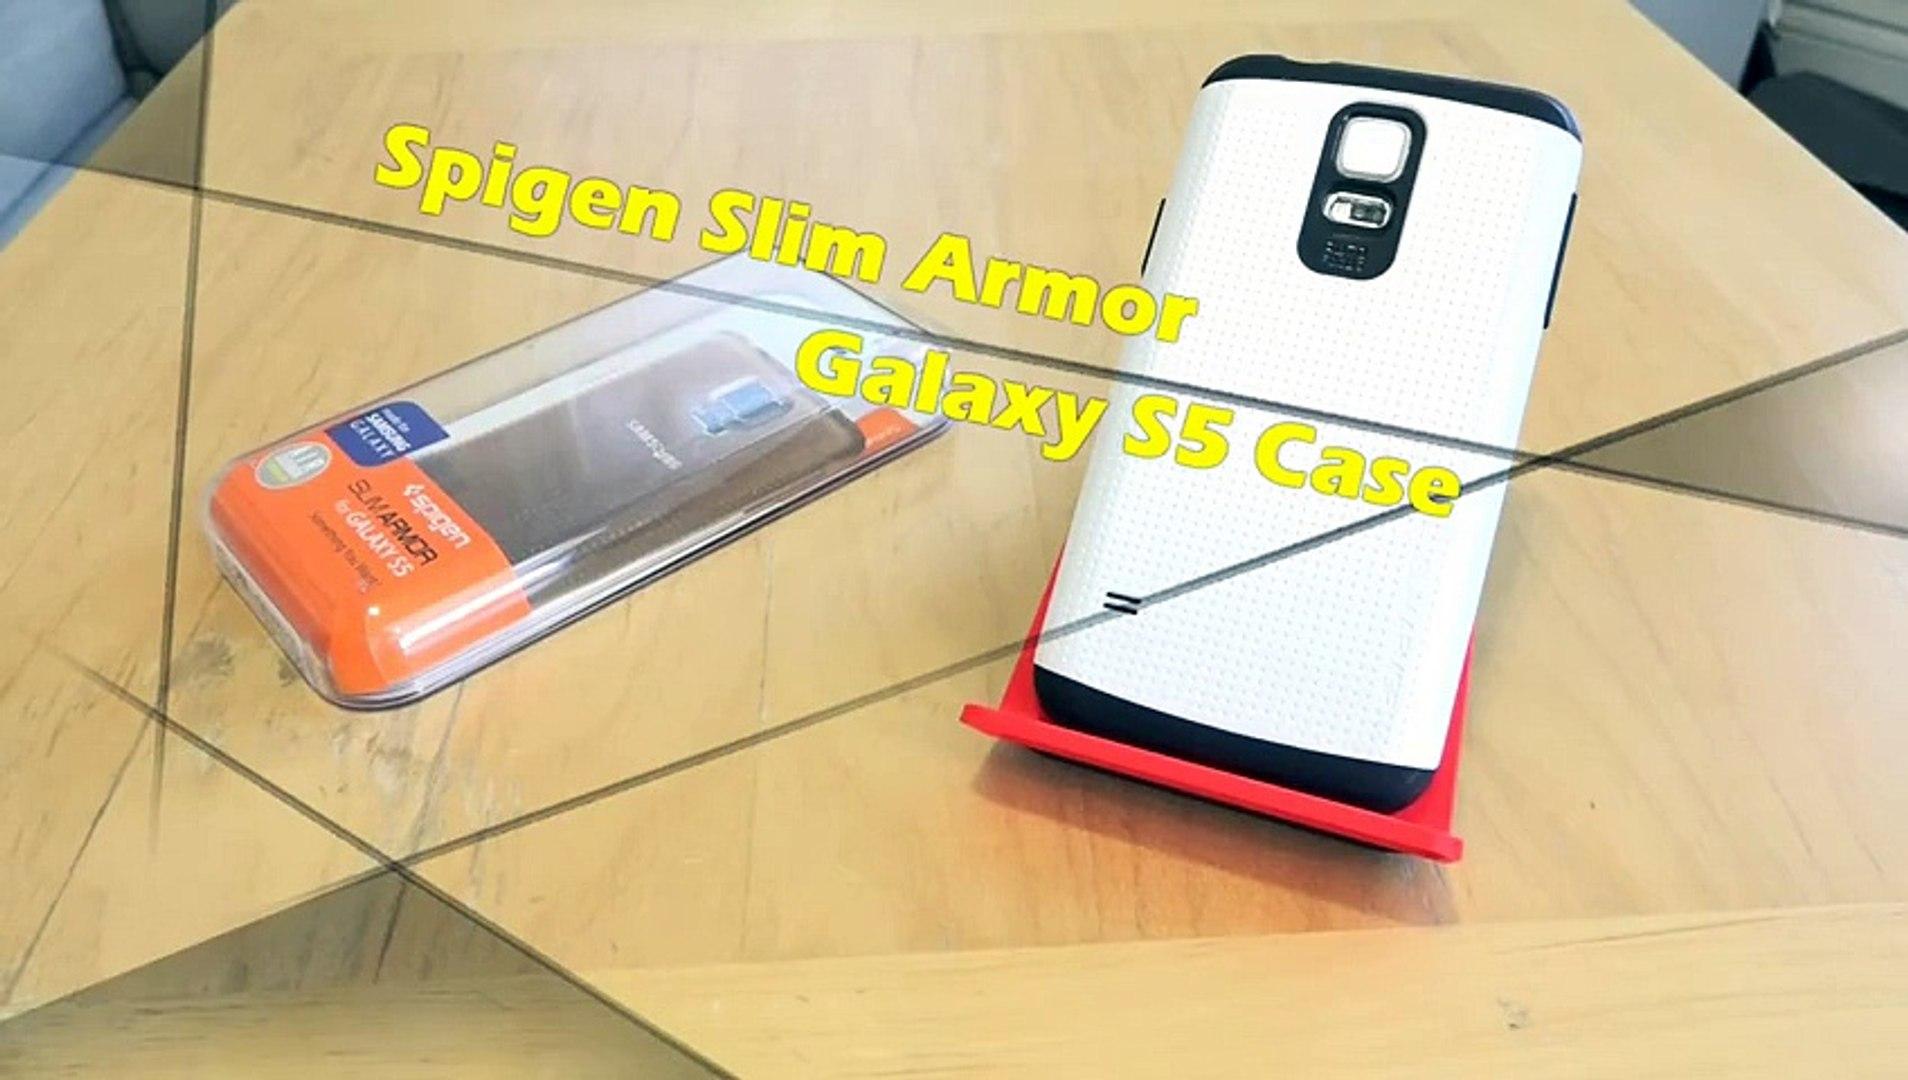 buy popular f00d3 53cb9 Spigen Slim Armor Samsung Galaxy S5 Case Review